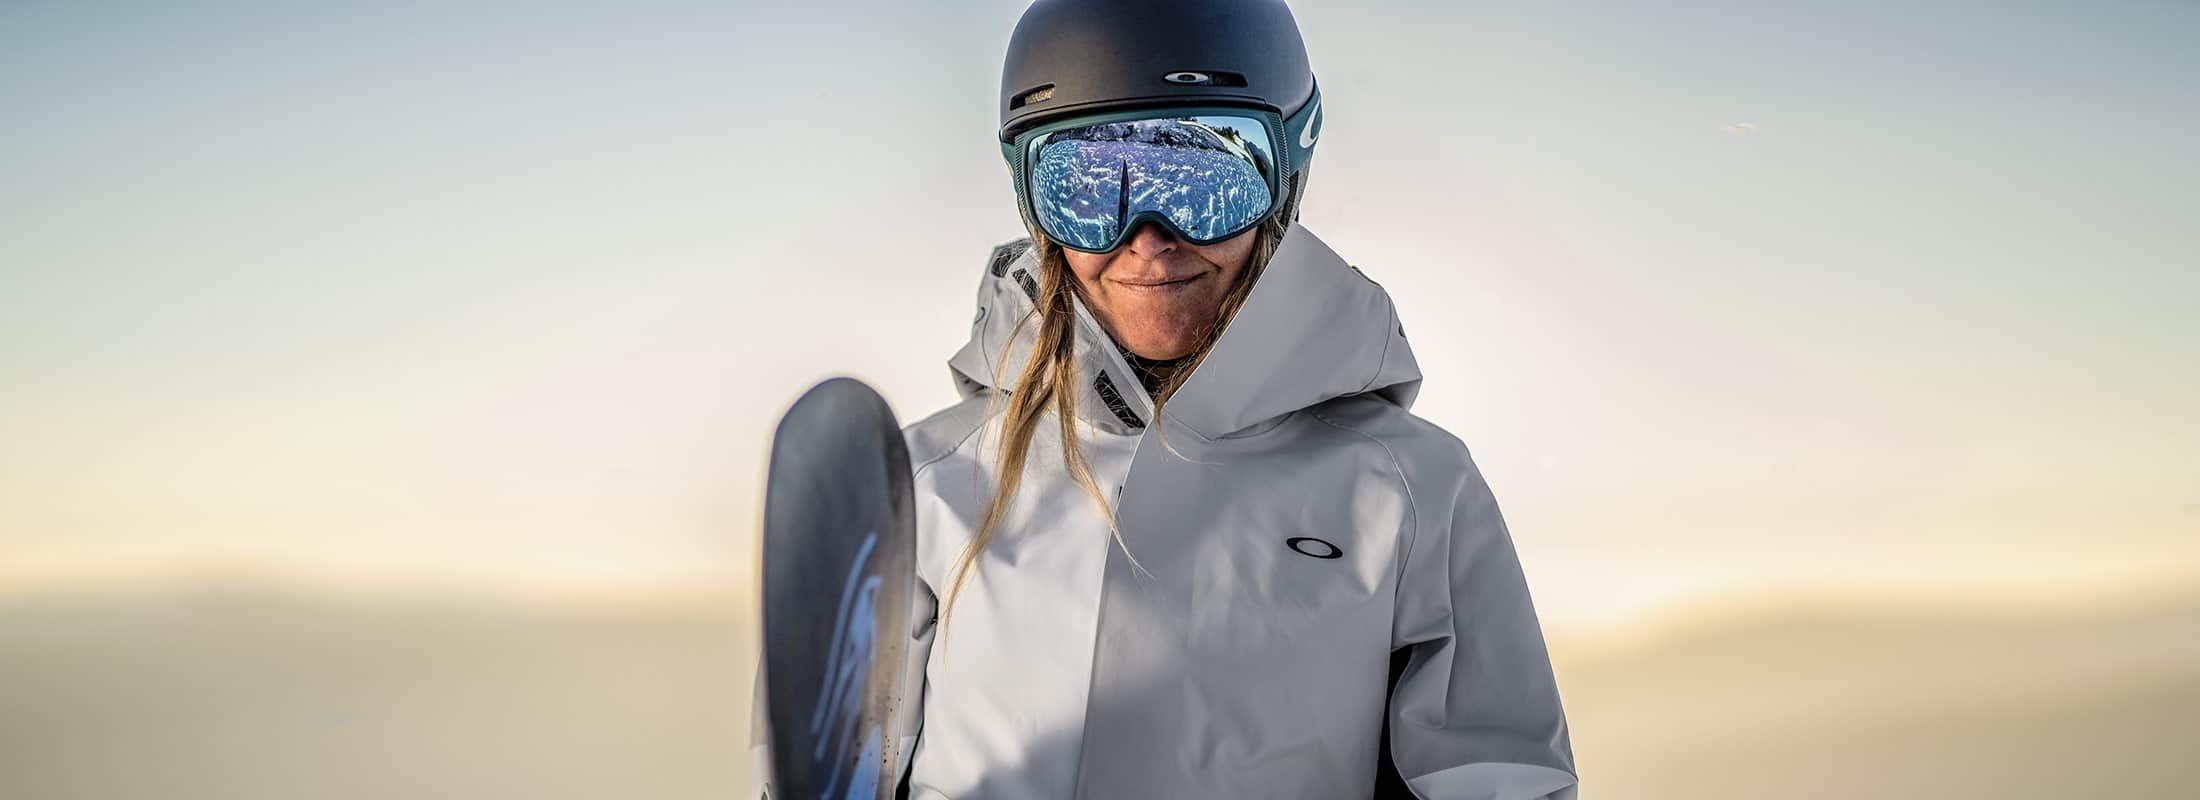 Best Ski & Snowboard Helmets in 2021